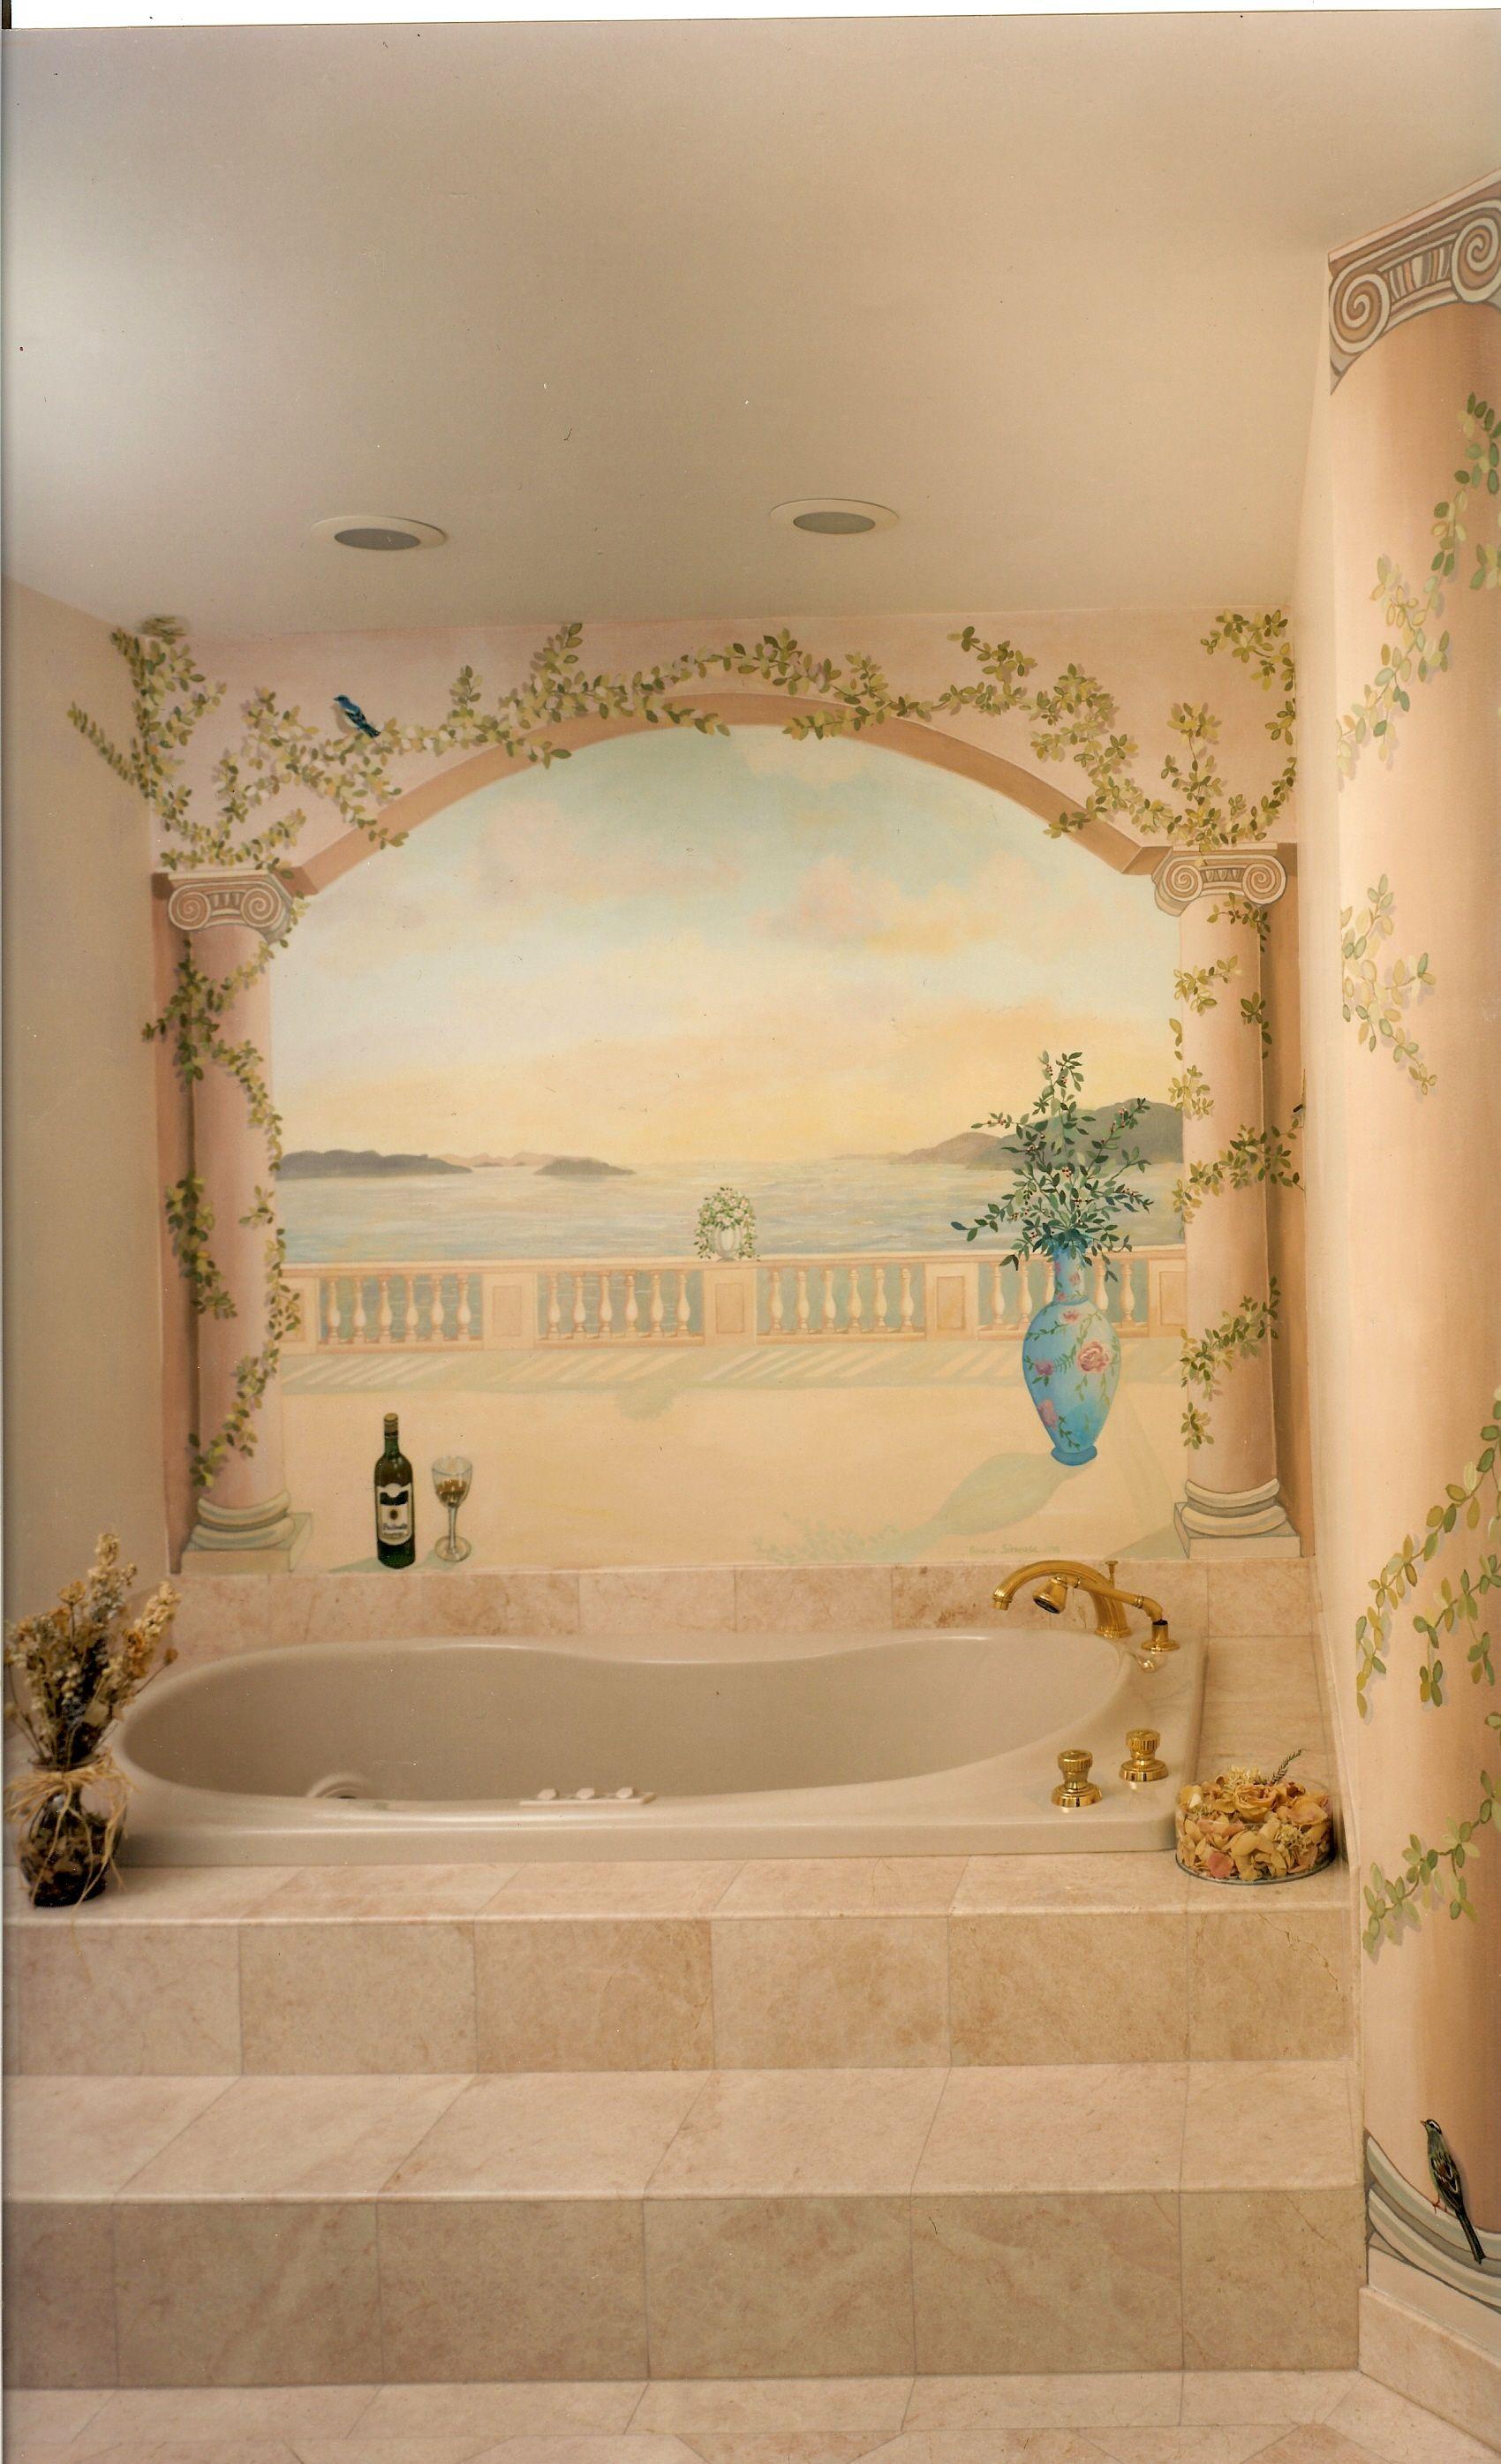 Fine Bathroom Wall Mural Ideas Ideas - The Wall Art Decorations ...